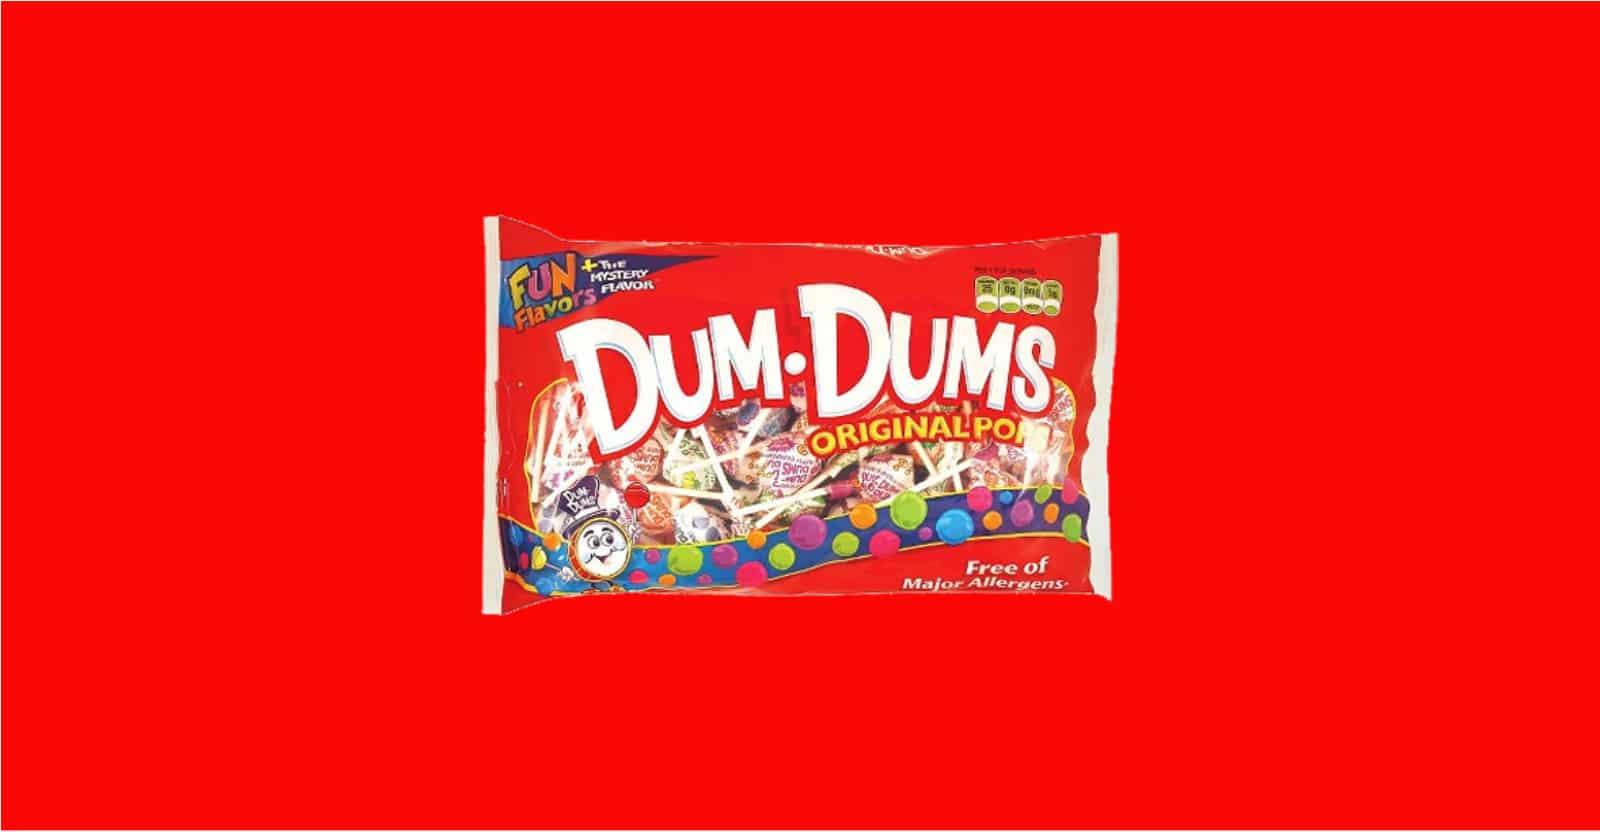 are dum dums gluten-free